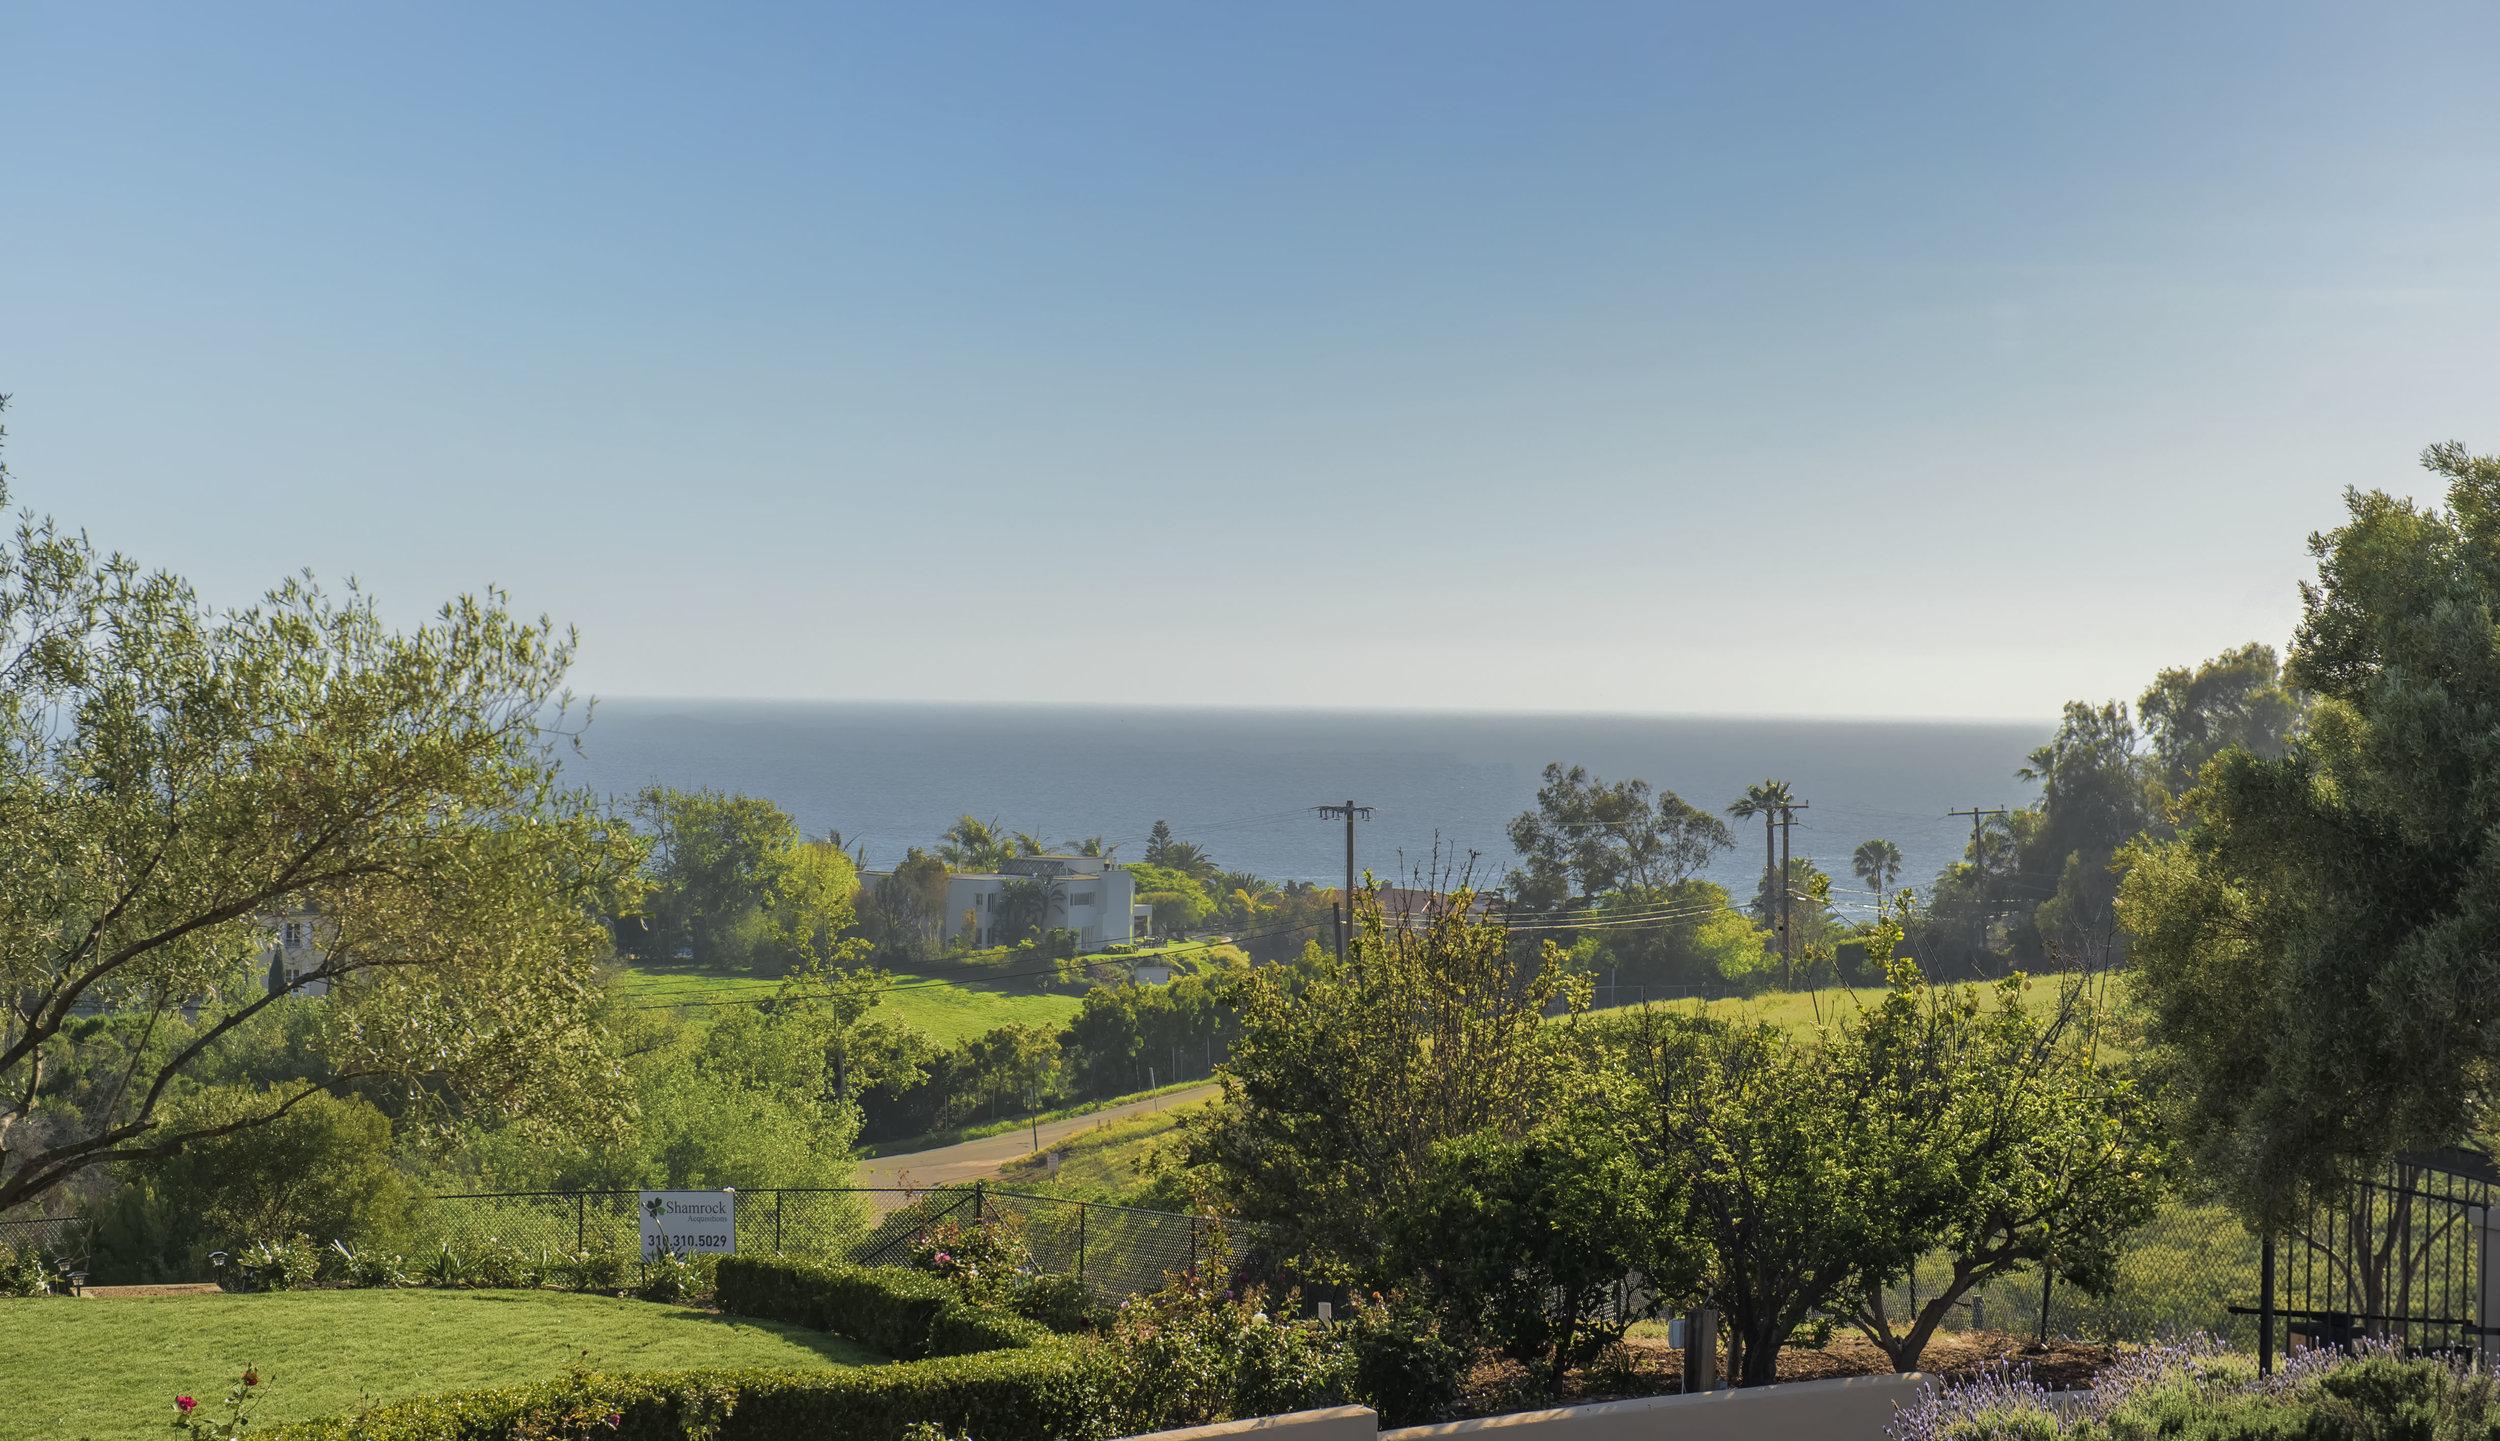 014 Ocean View 6130 Via Cabrillo For Sale Lease The Malibu Life Team Luxury Real Estate.jpg